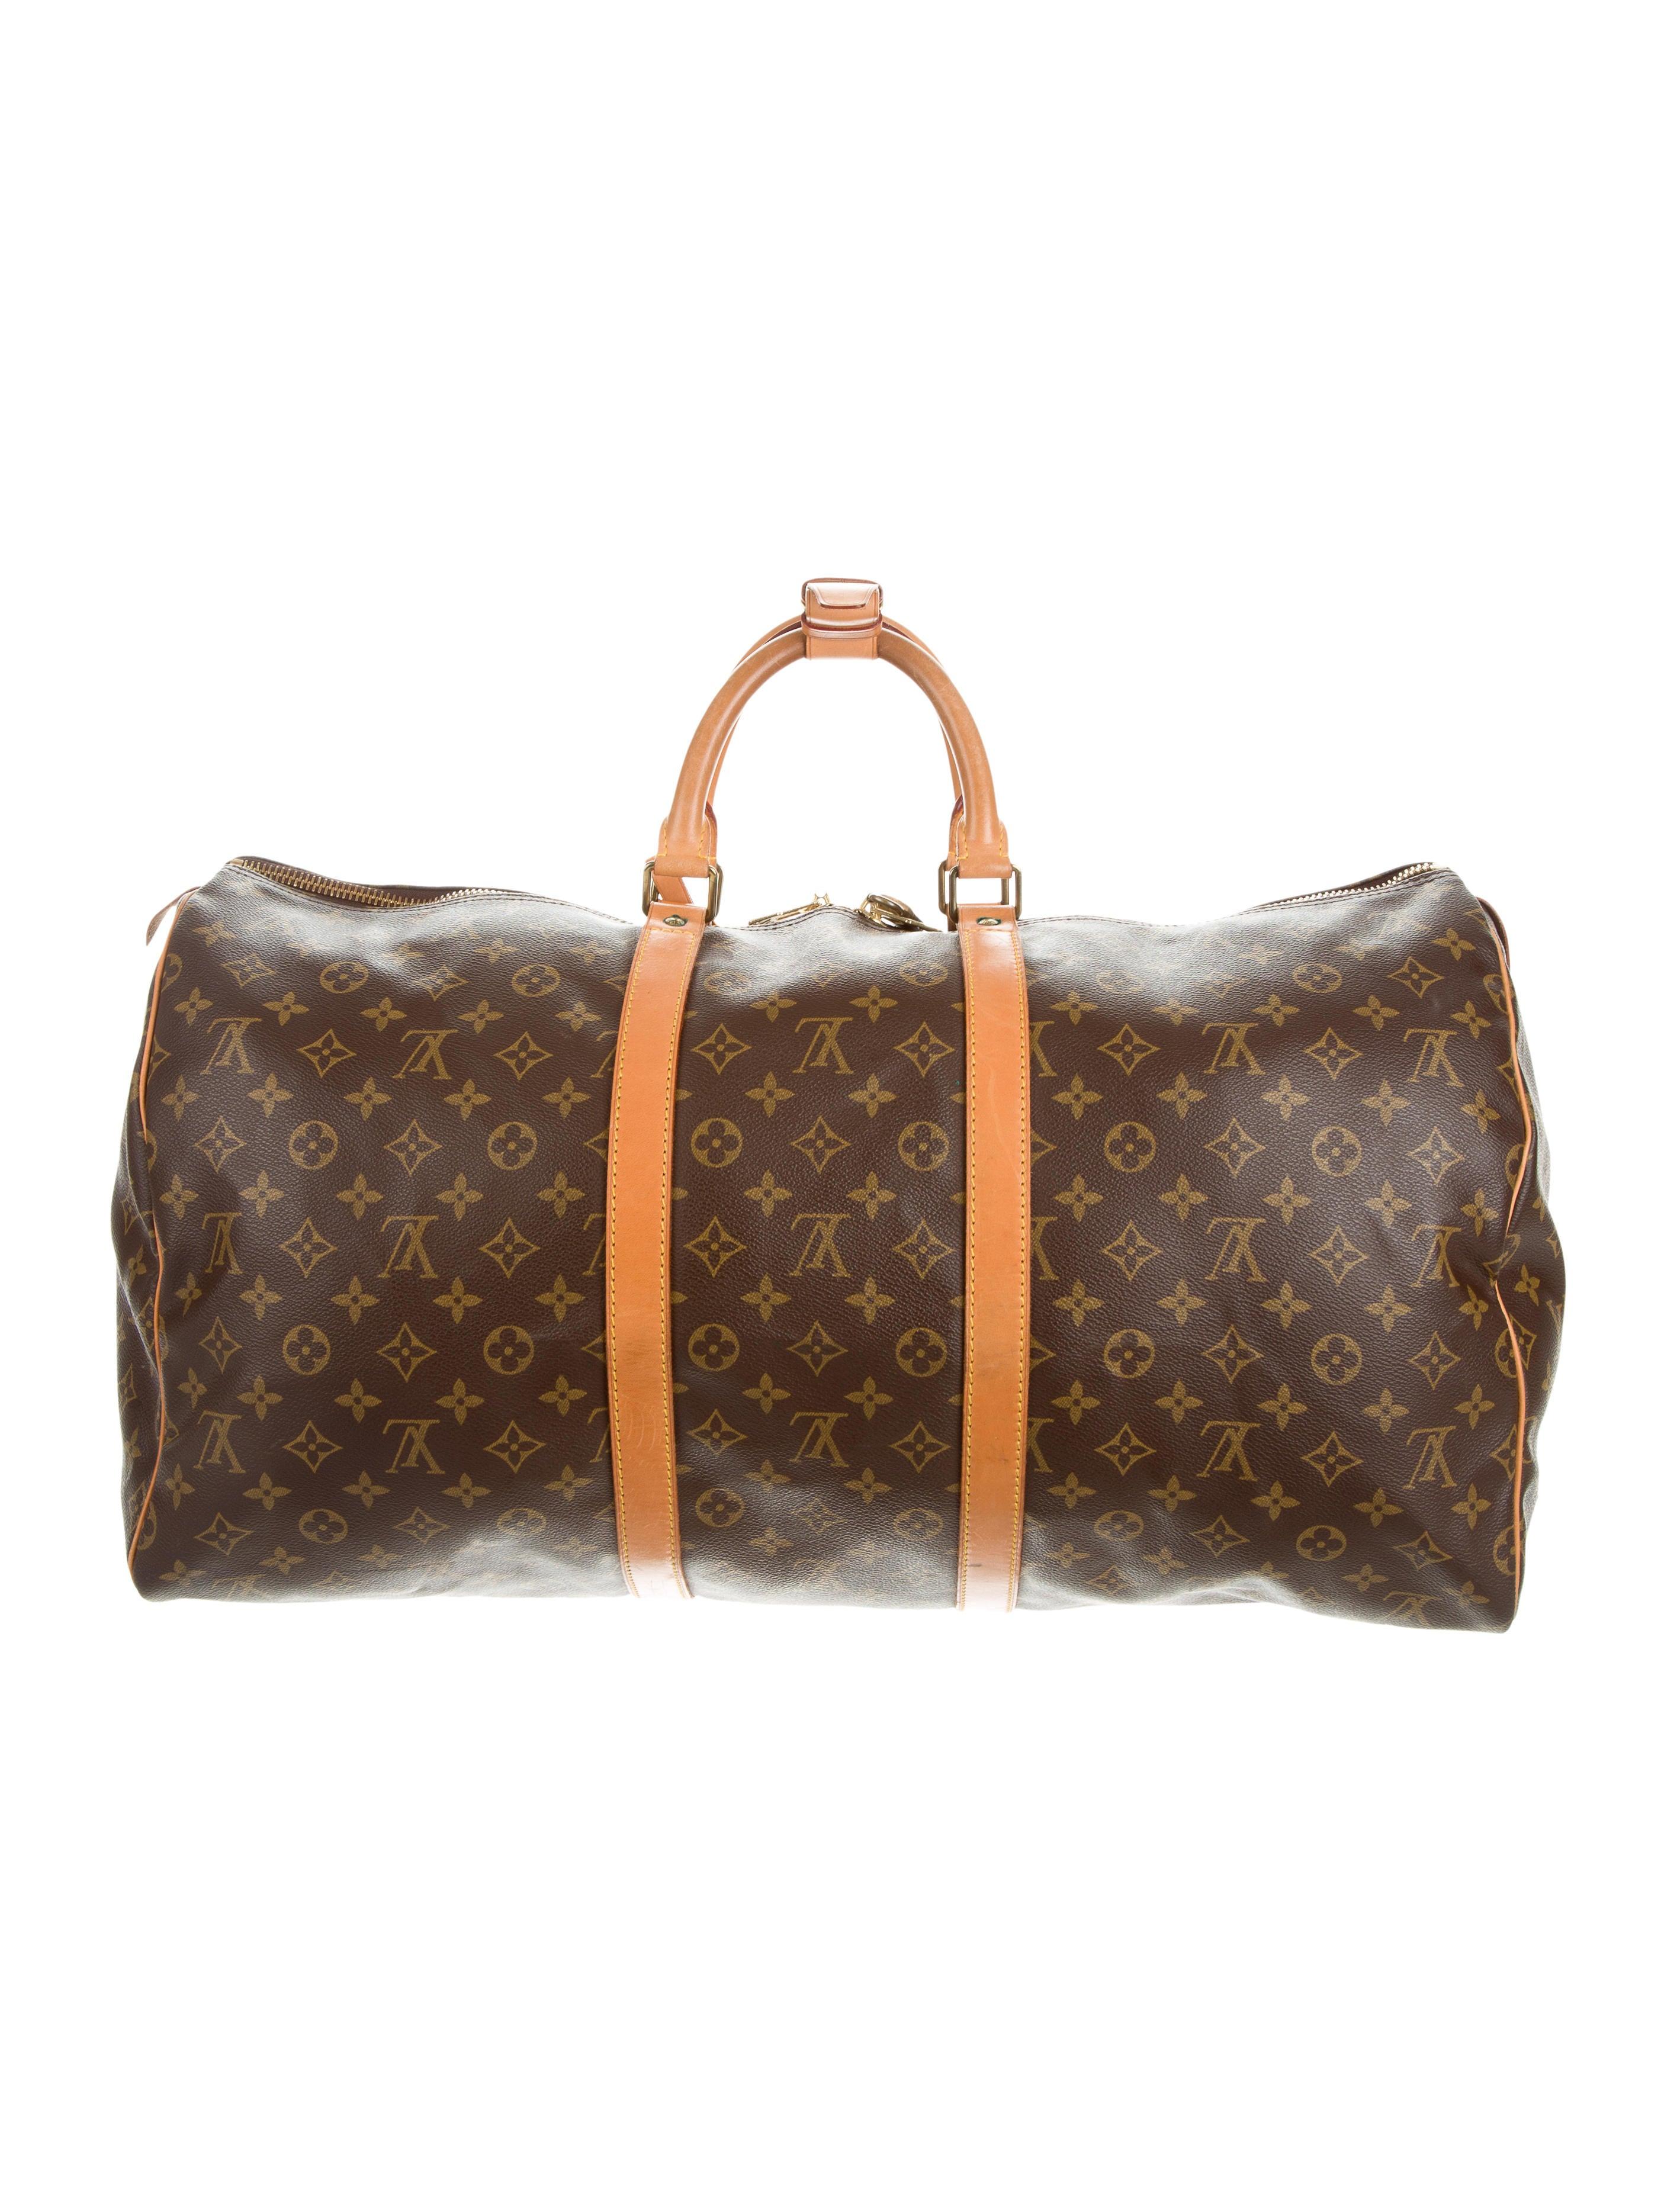 louis vuitton monogram keepall 55 handbags lou121222 the realreal. Black Bedroom Furniture Sets. Home Design Ideas